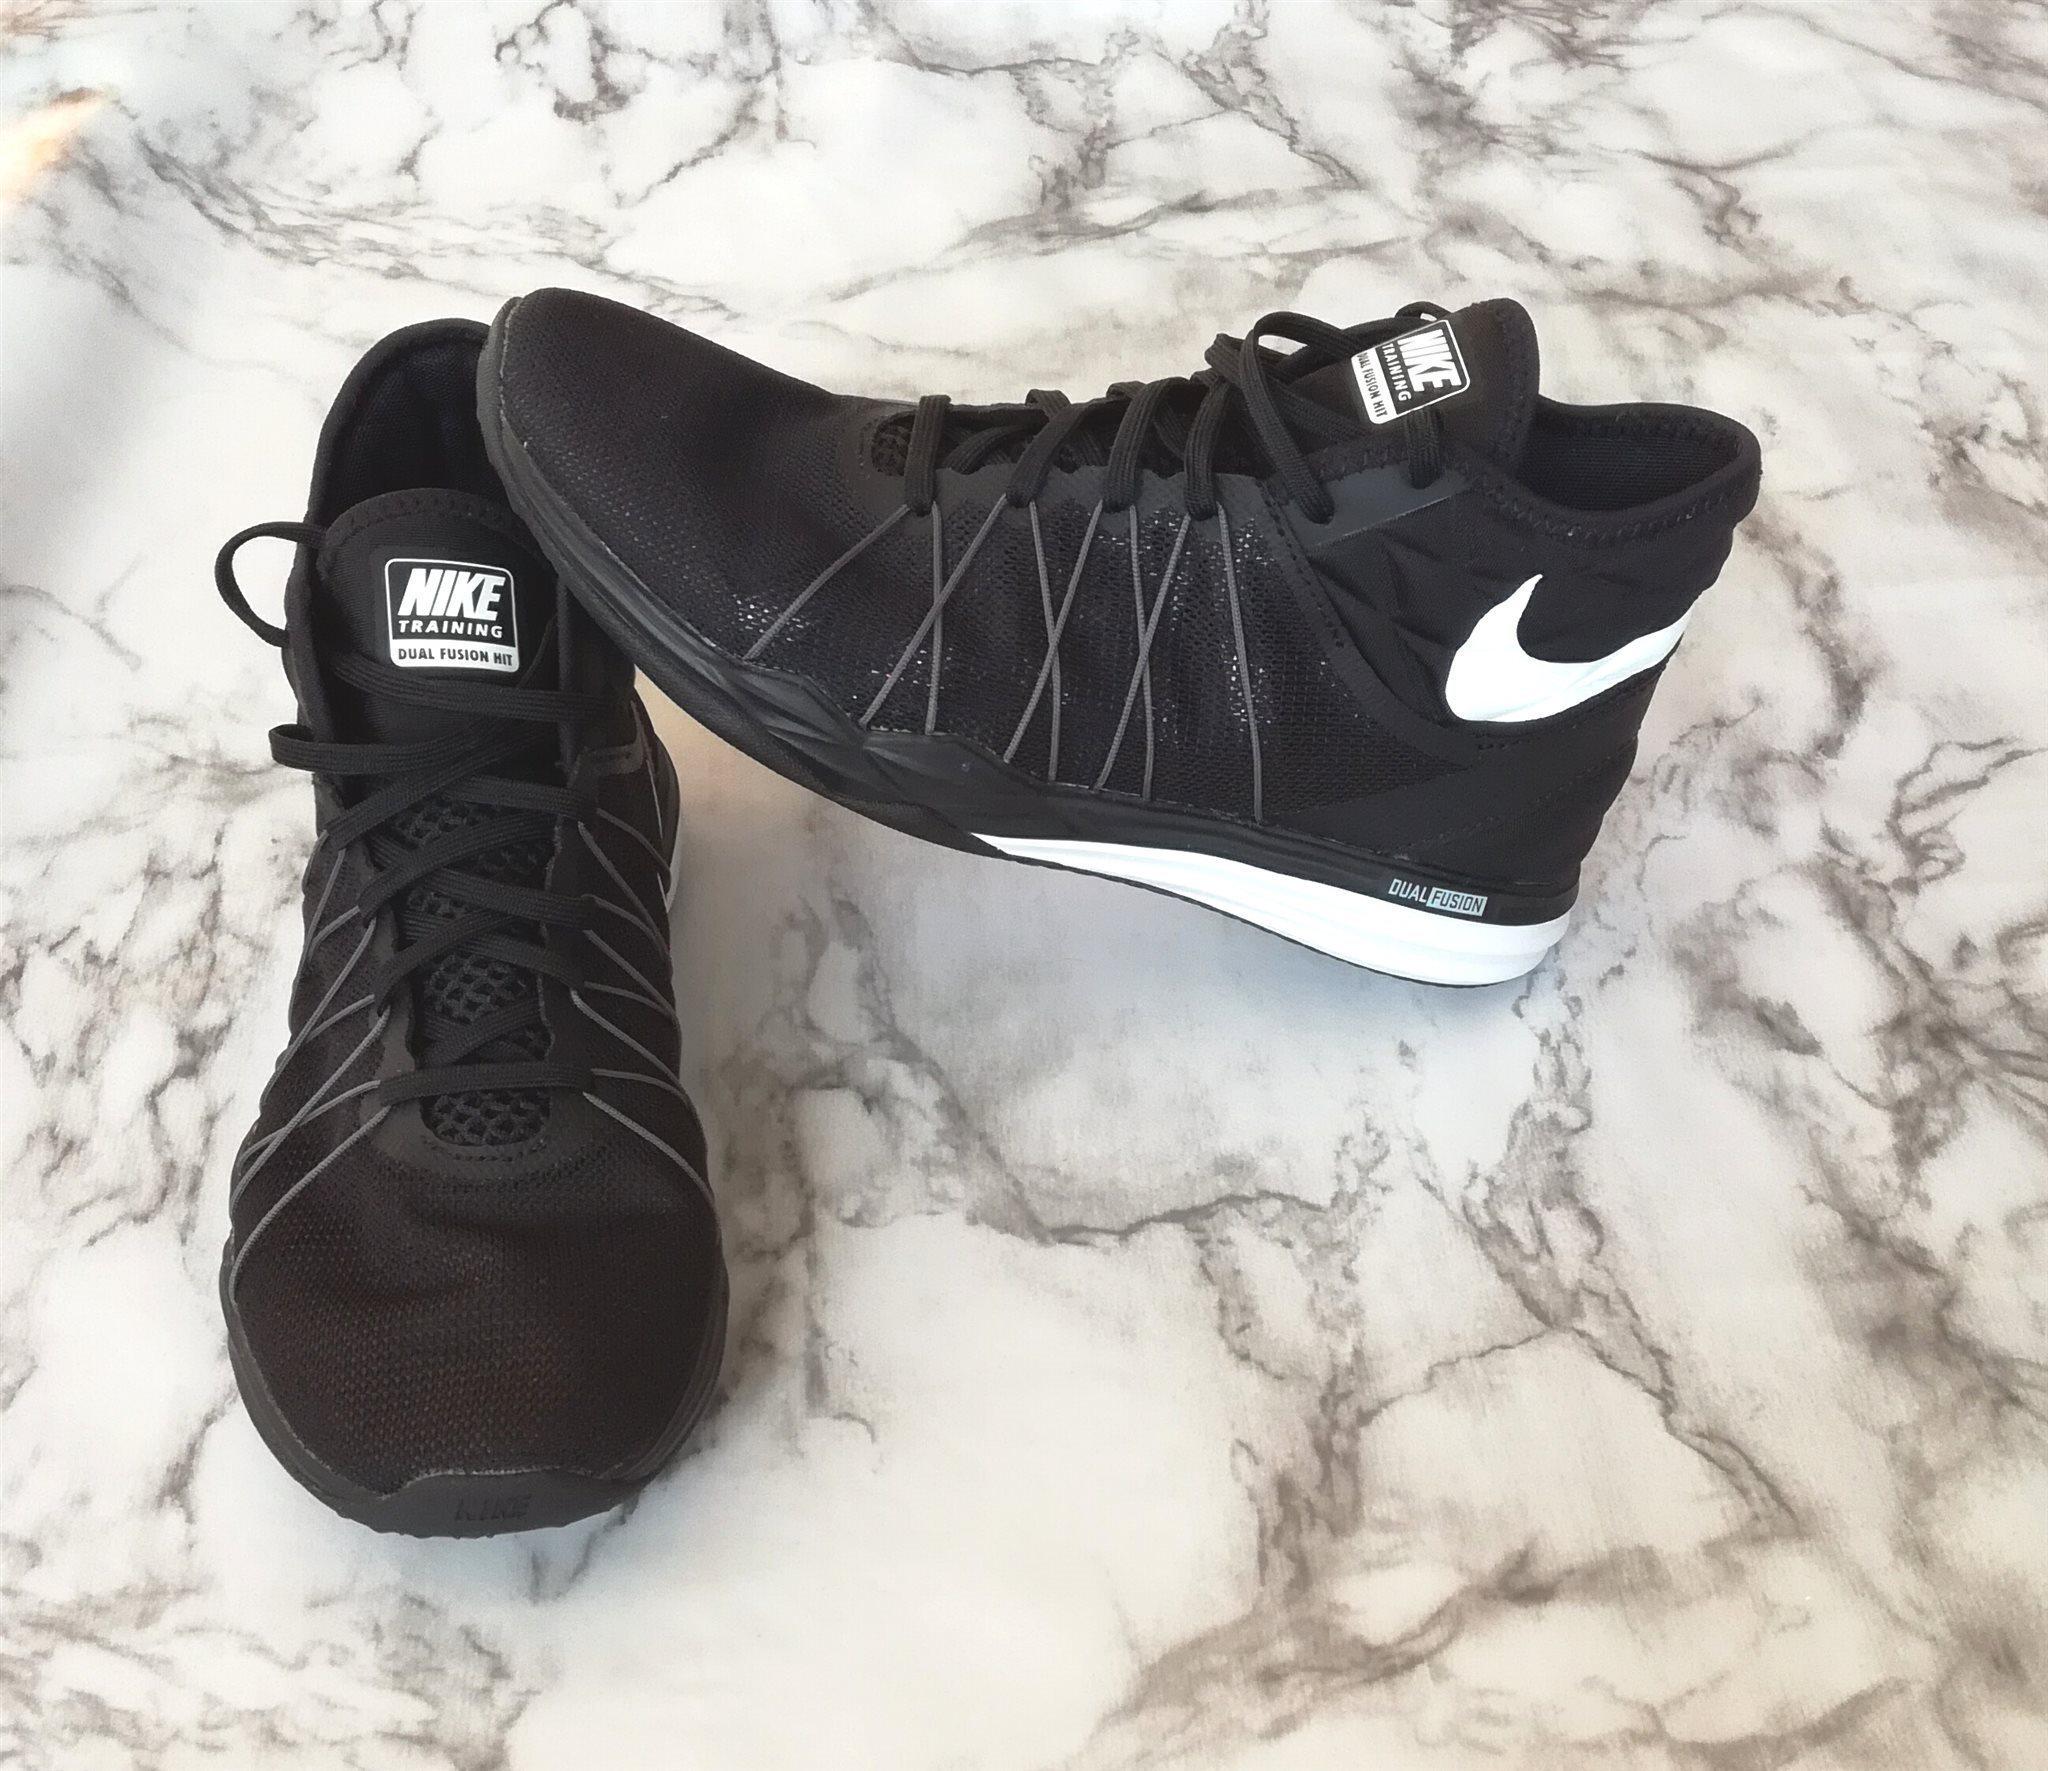 online retailer 86c98 2a15d Nike skor, NYA, storlek 38.5, Fri Frakt